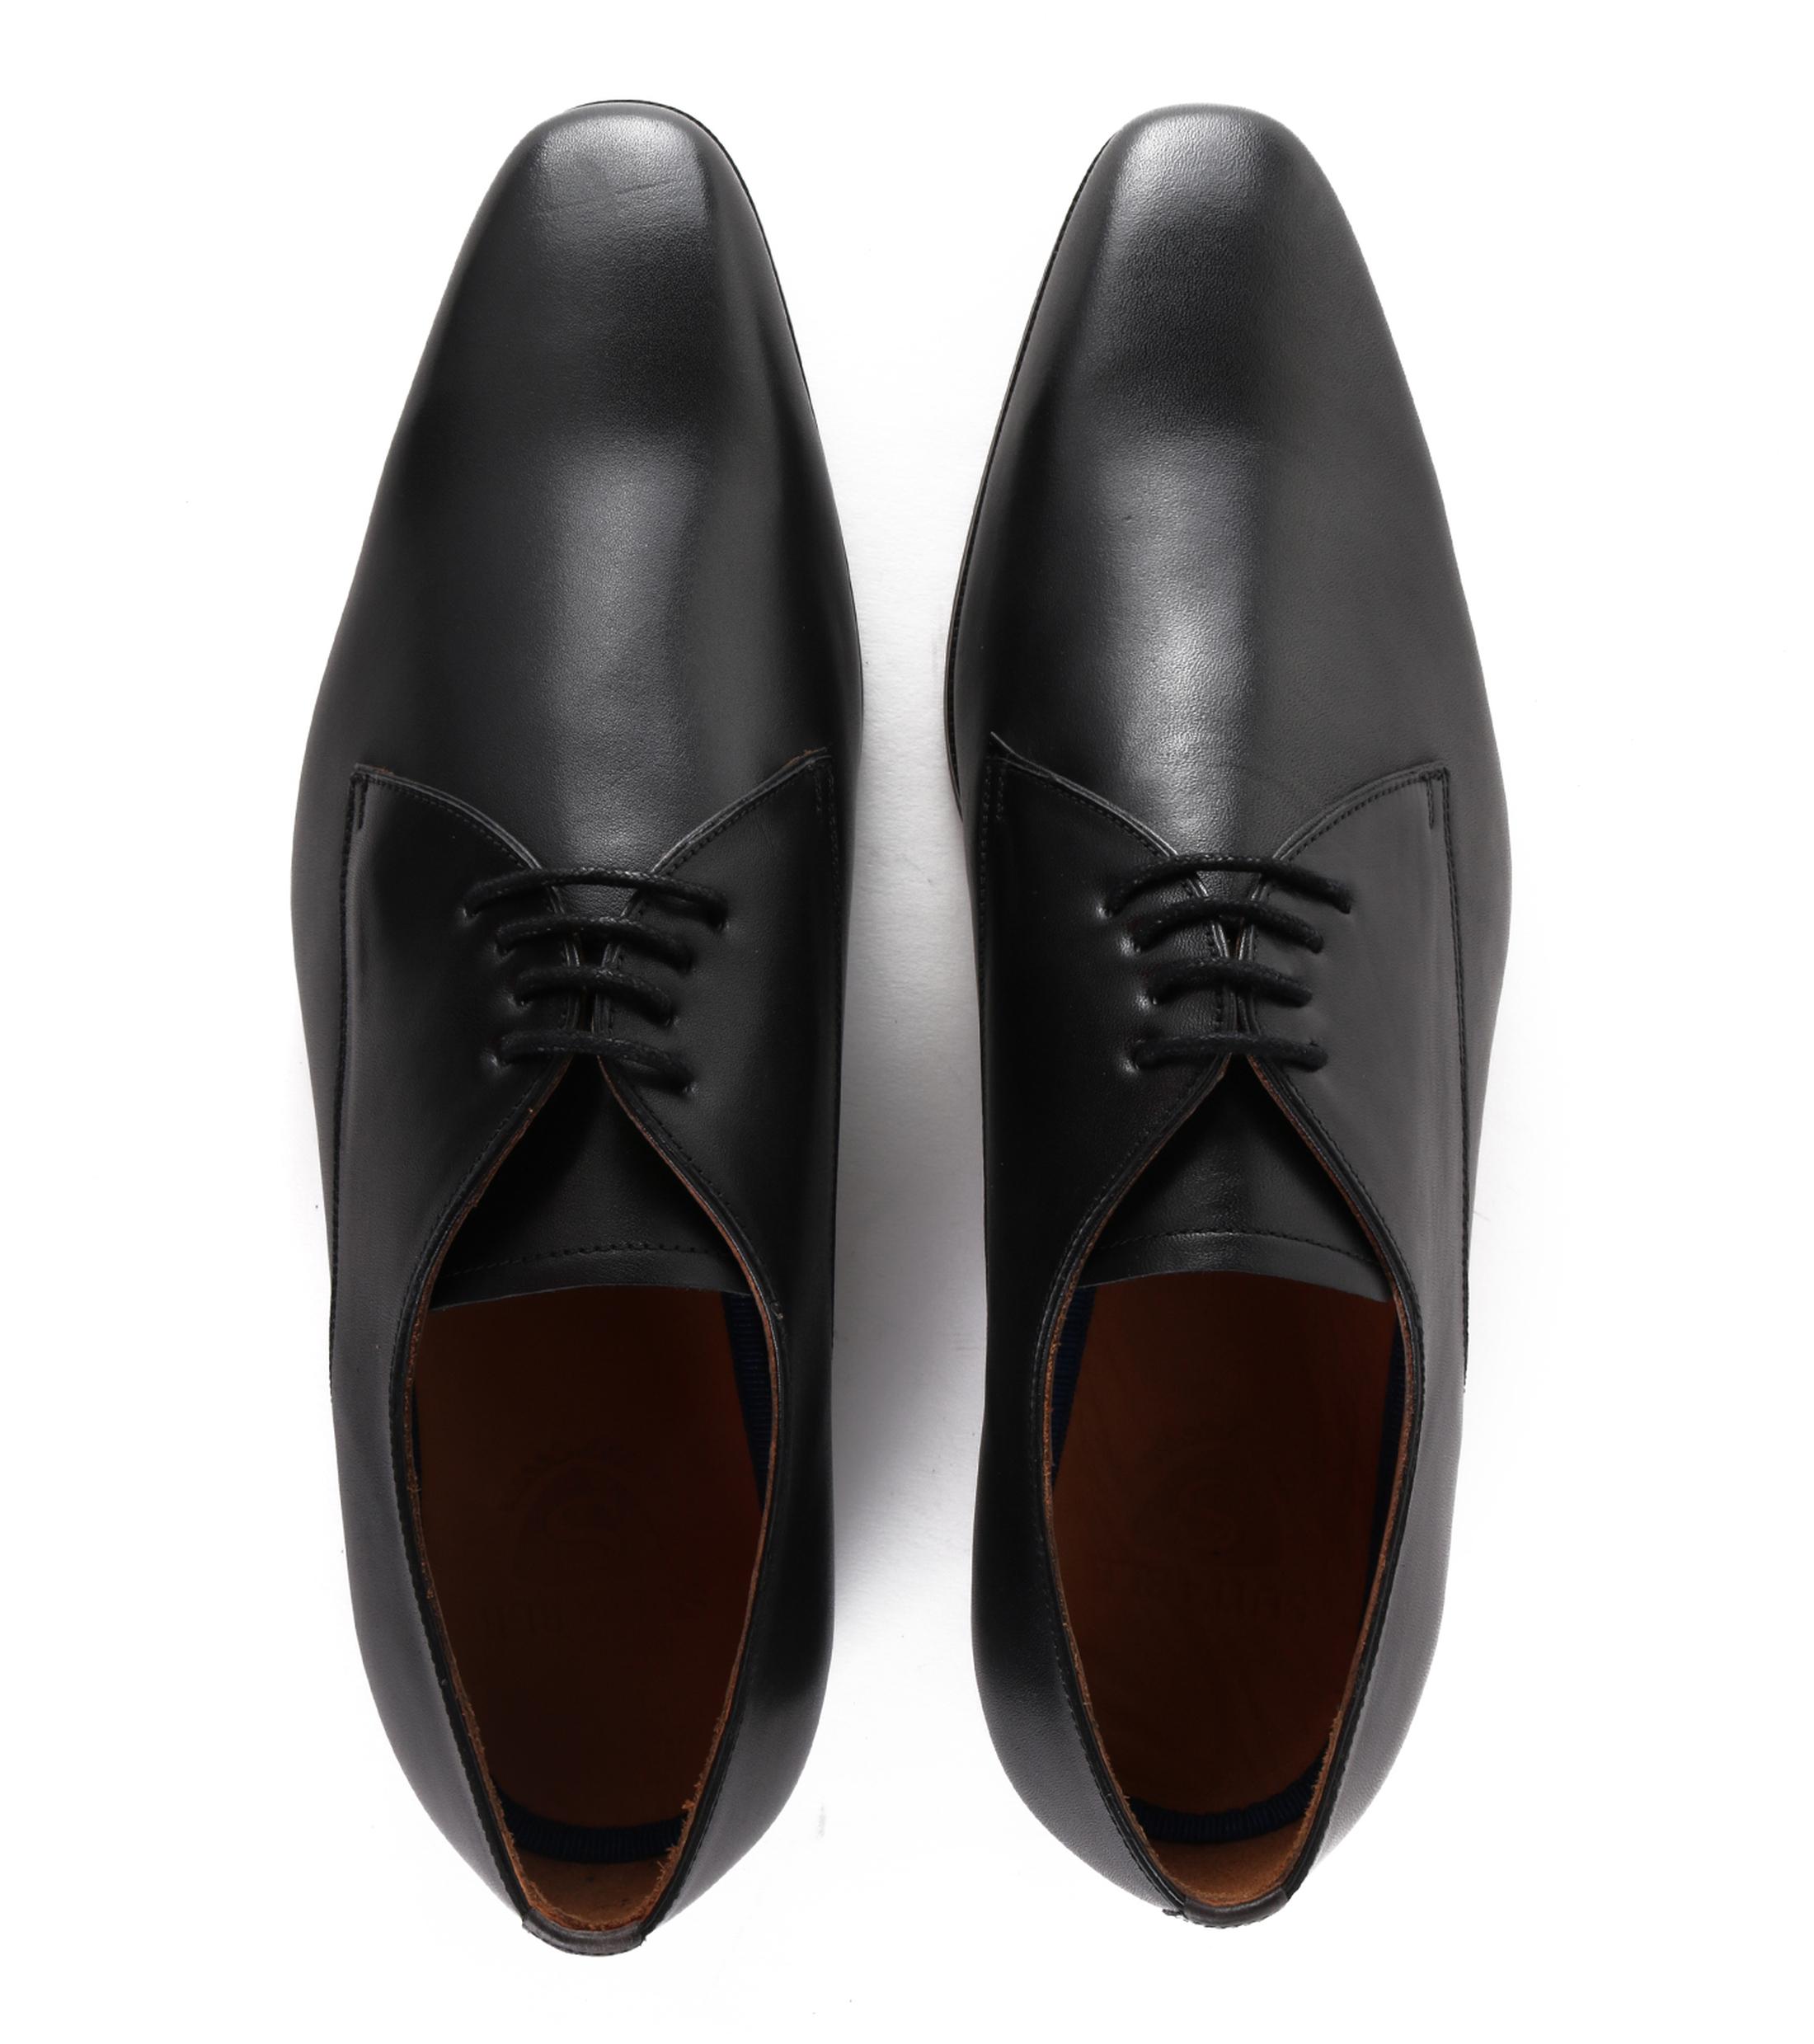 Chaussures Hommes Stbl En Cuir De Luxe Noir 039ySU